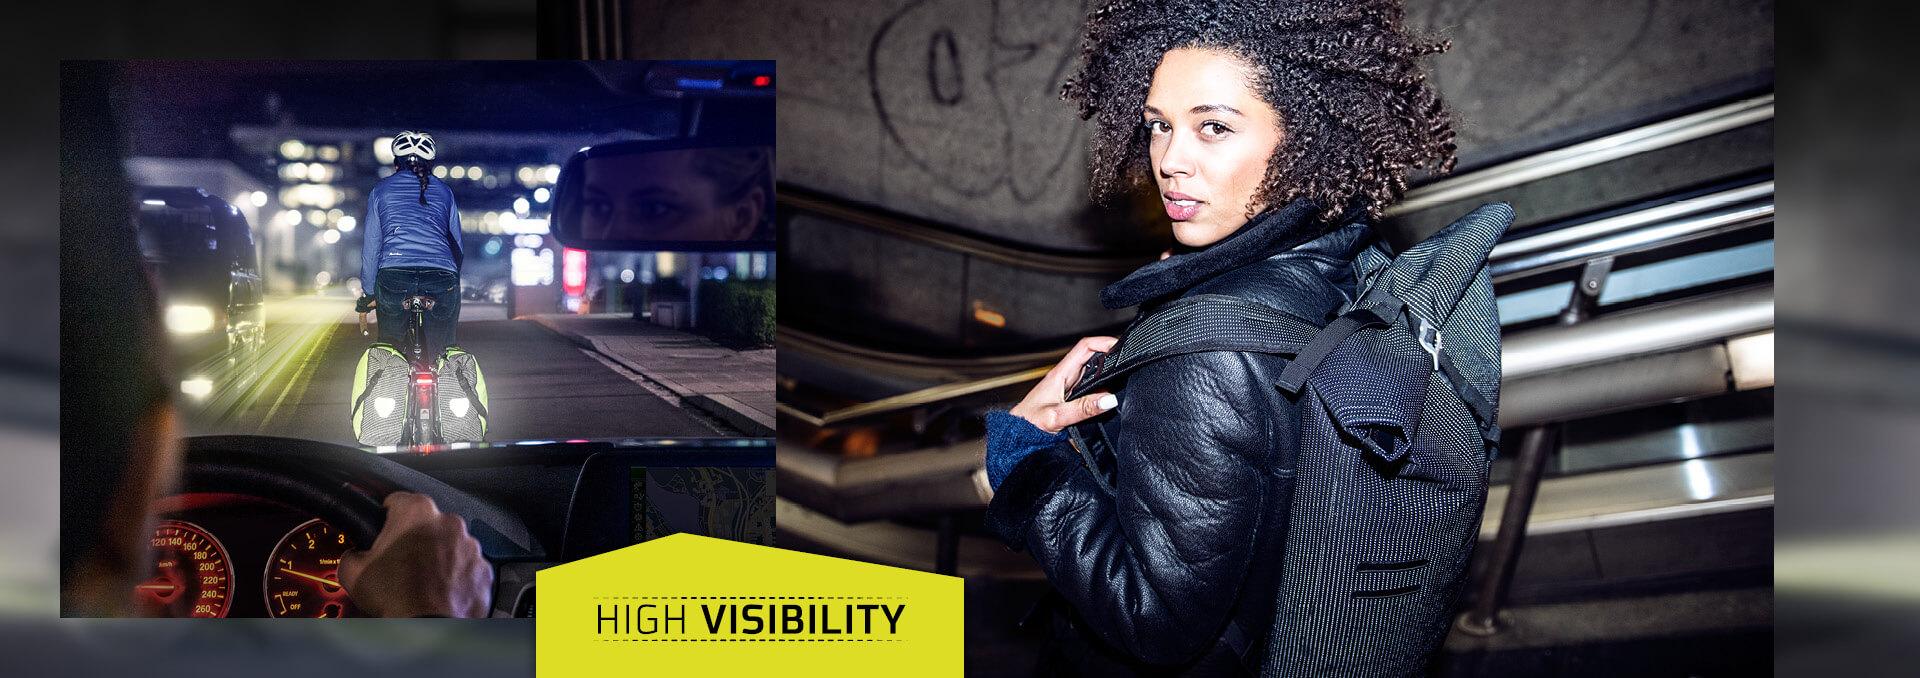 High Visibility Line